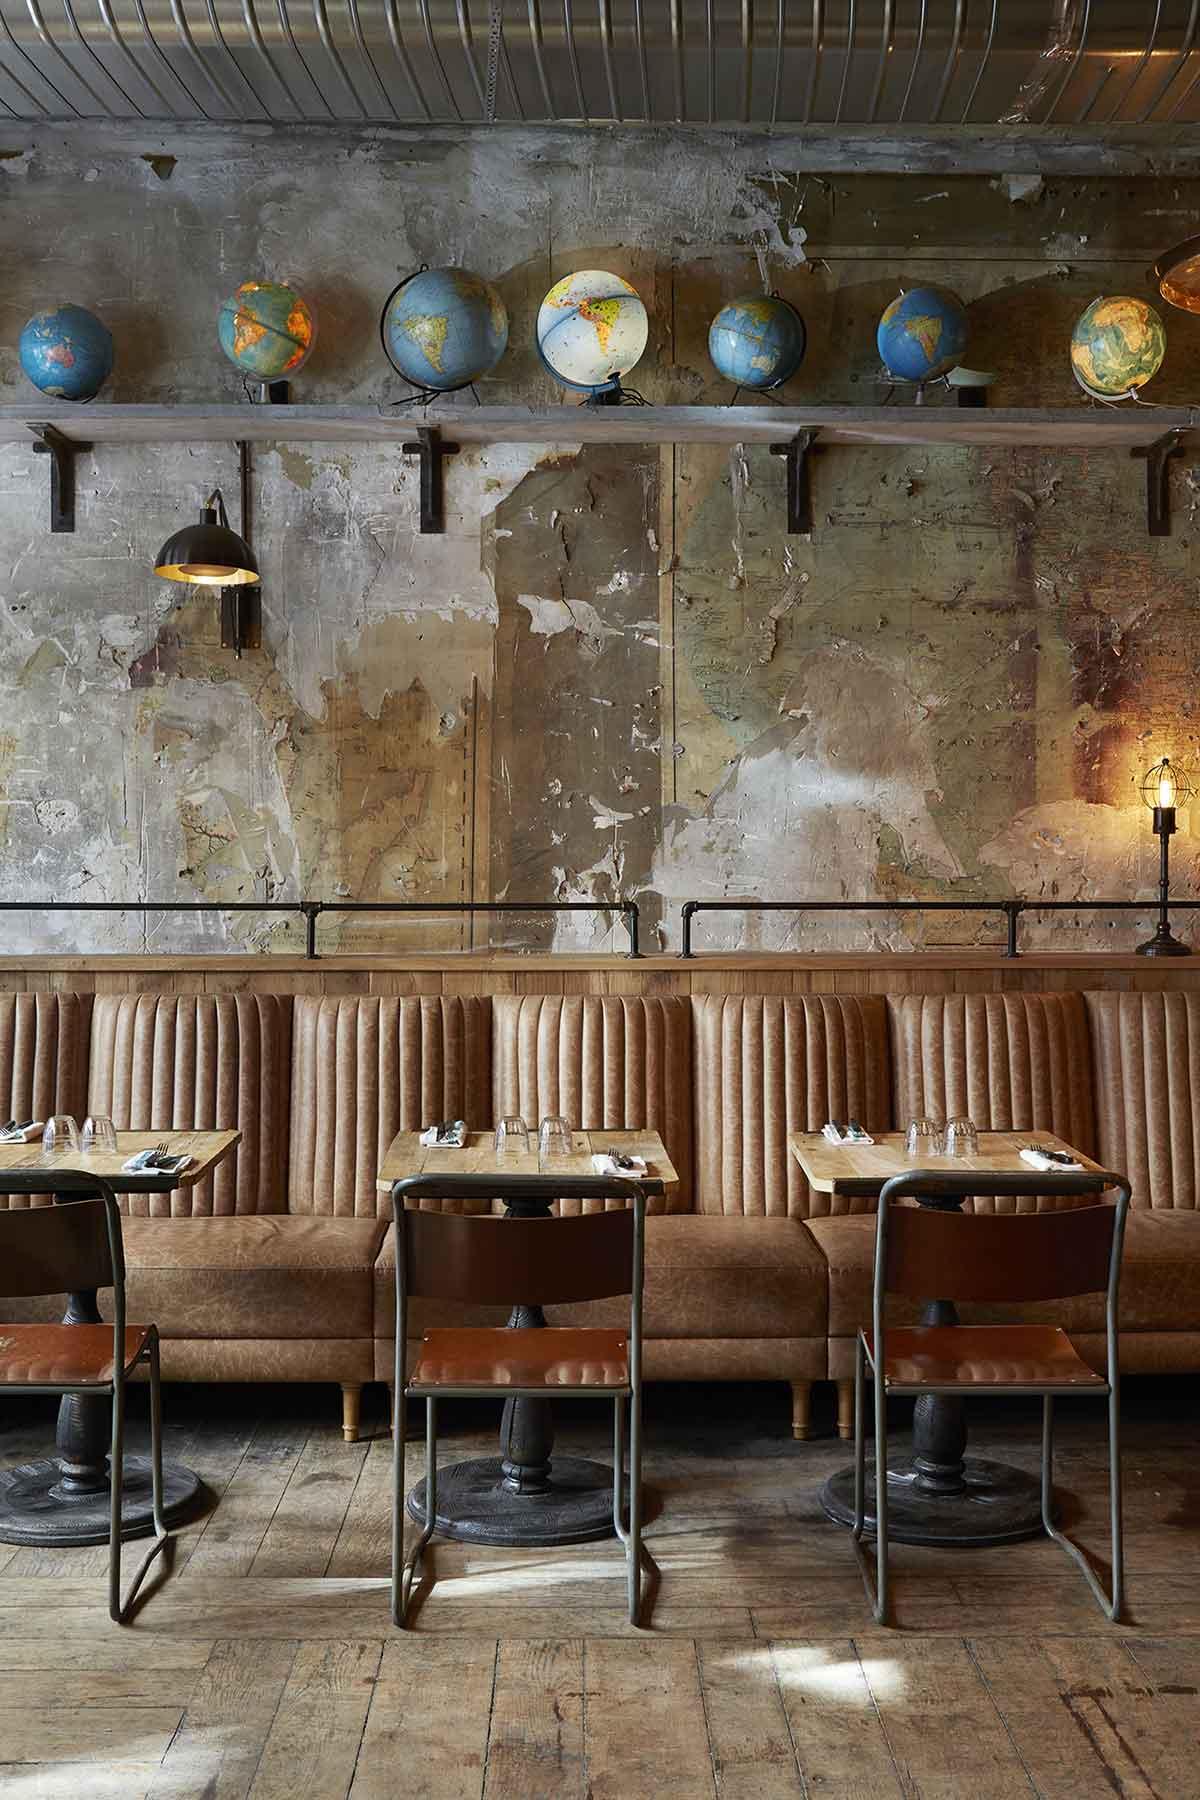 Decoraci n industrial para restaurantes italianos - Decoracion forja pared ...